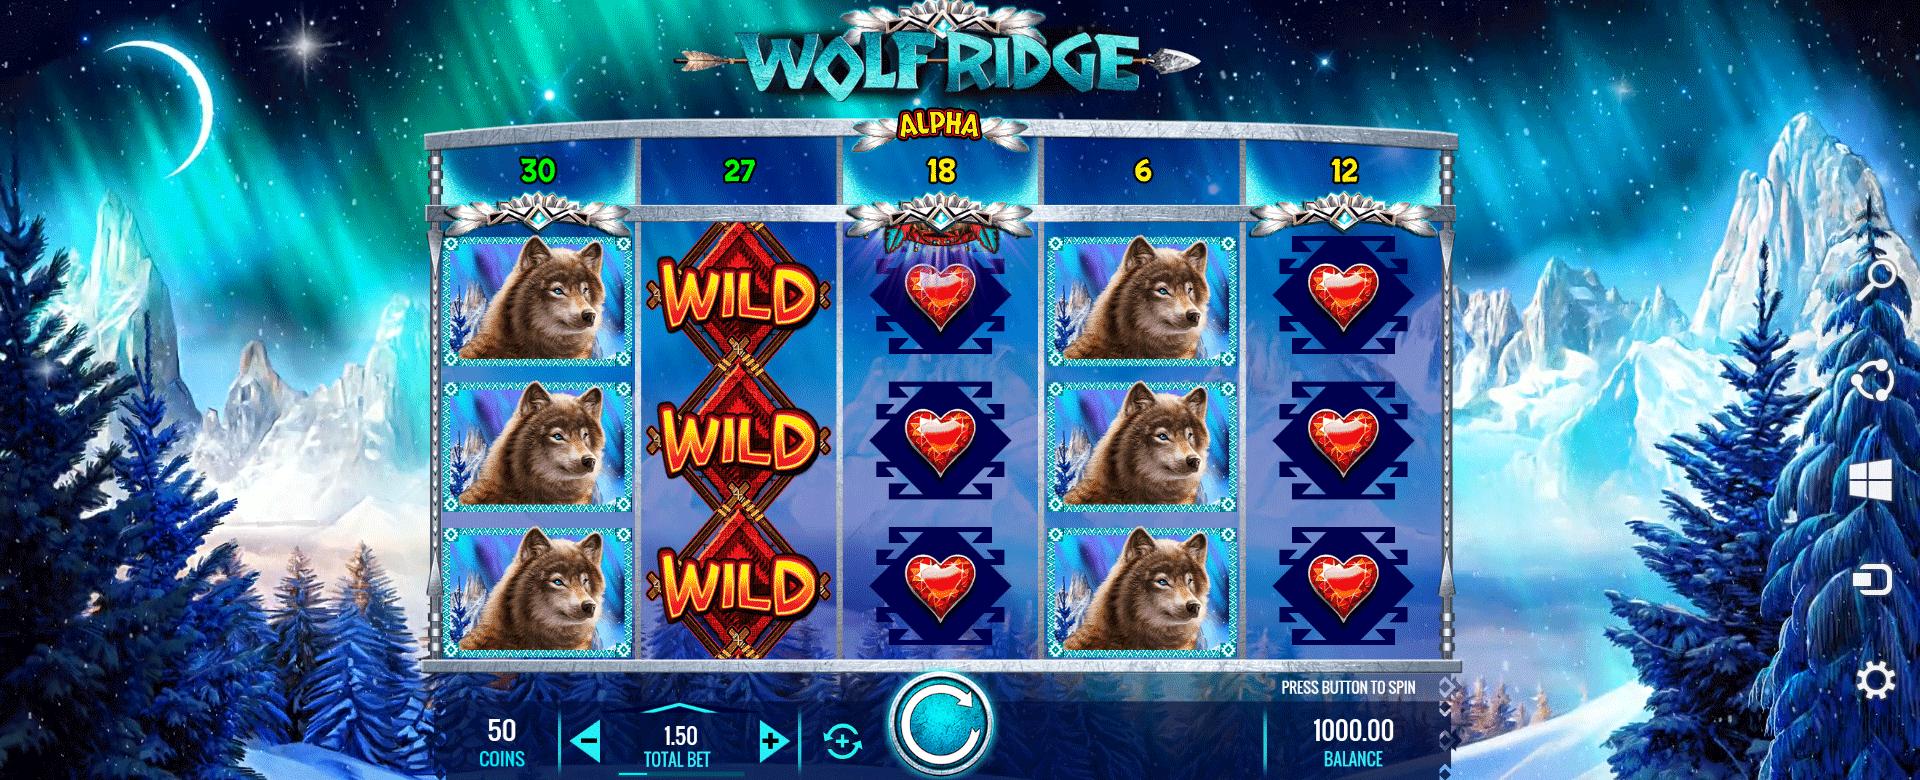 Slot Wolf Ridge